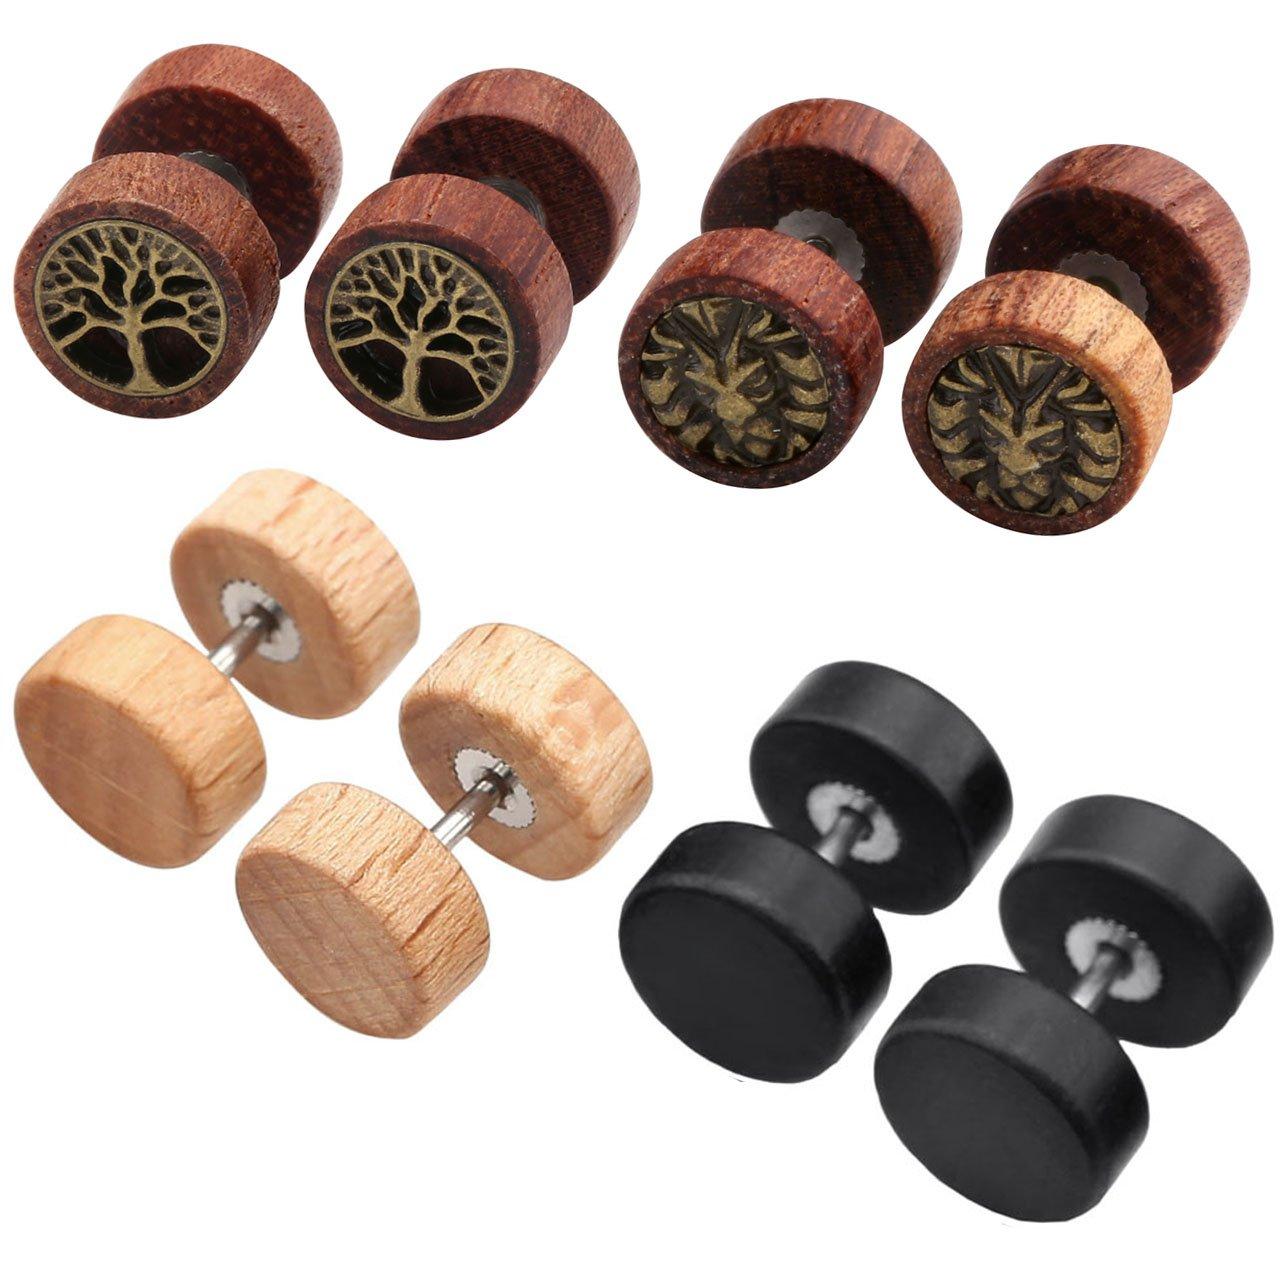 Jovivi 2-4pc Organic Sono Wood Lion Head/Tree of Life Cheater Fake Ear Plugs Gauges 10mm Illusion Screw Stud Earrings AJ1010104128